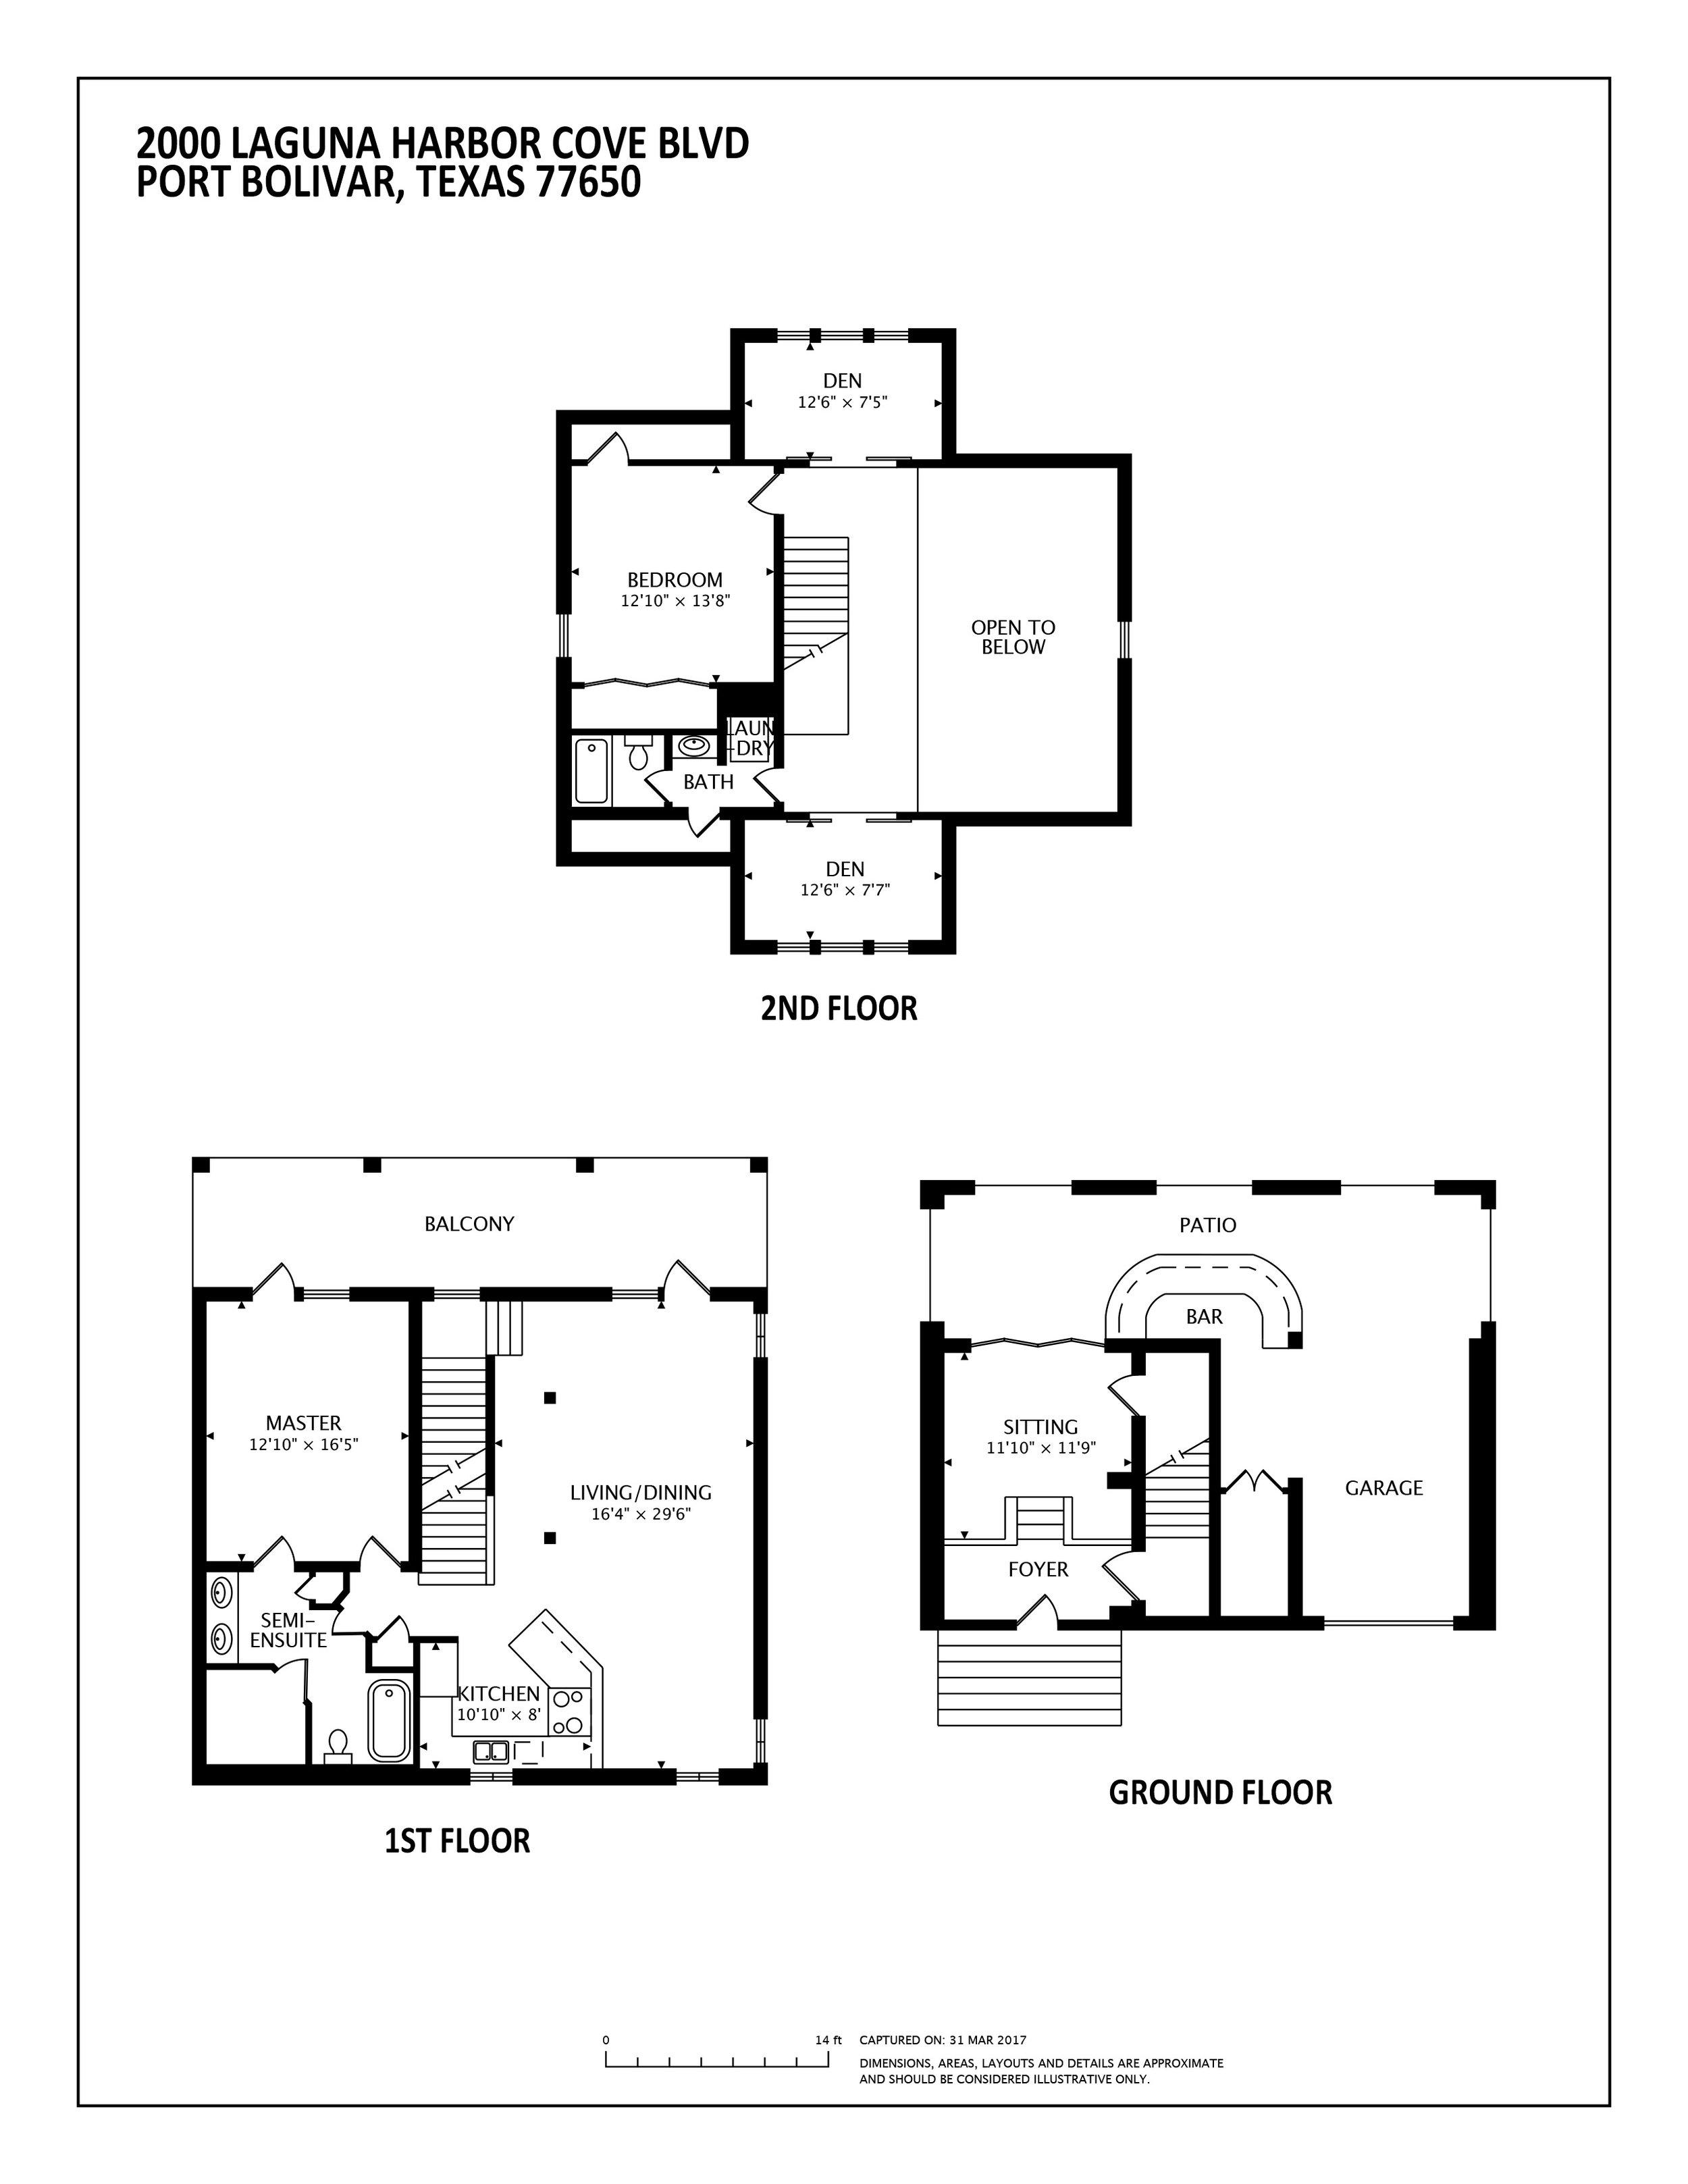 2000-LH-Cove---Floor-Plan---FINAL.jpg